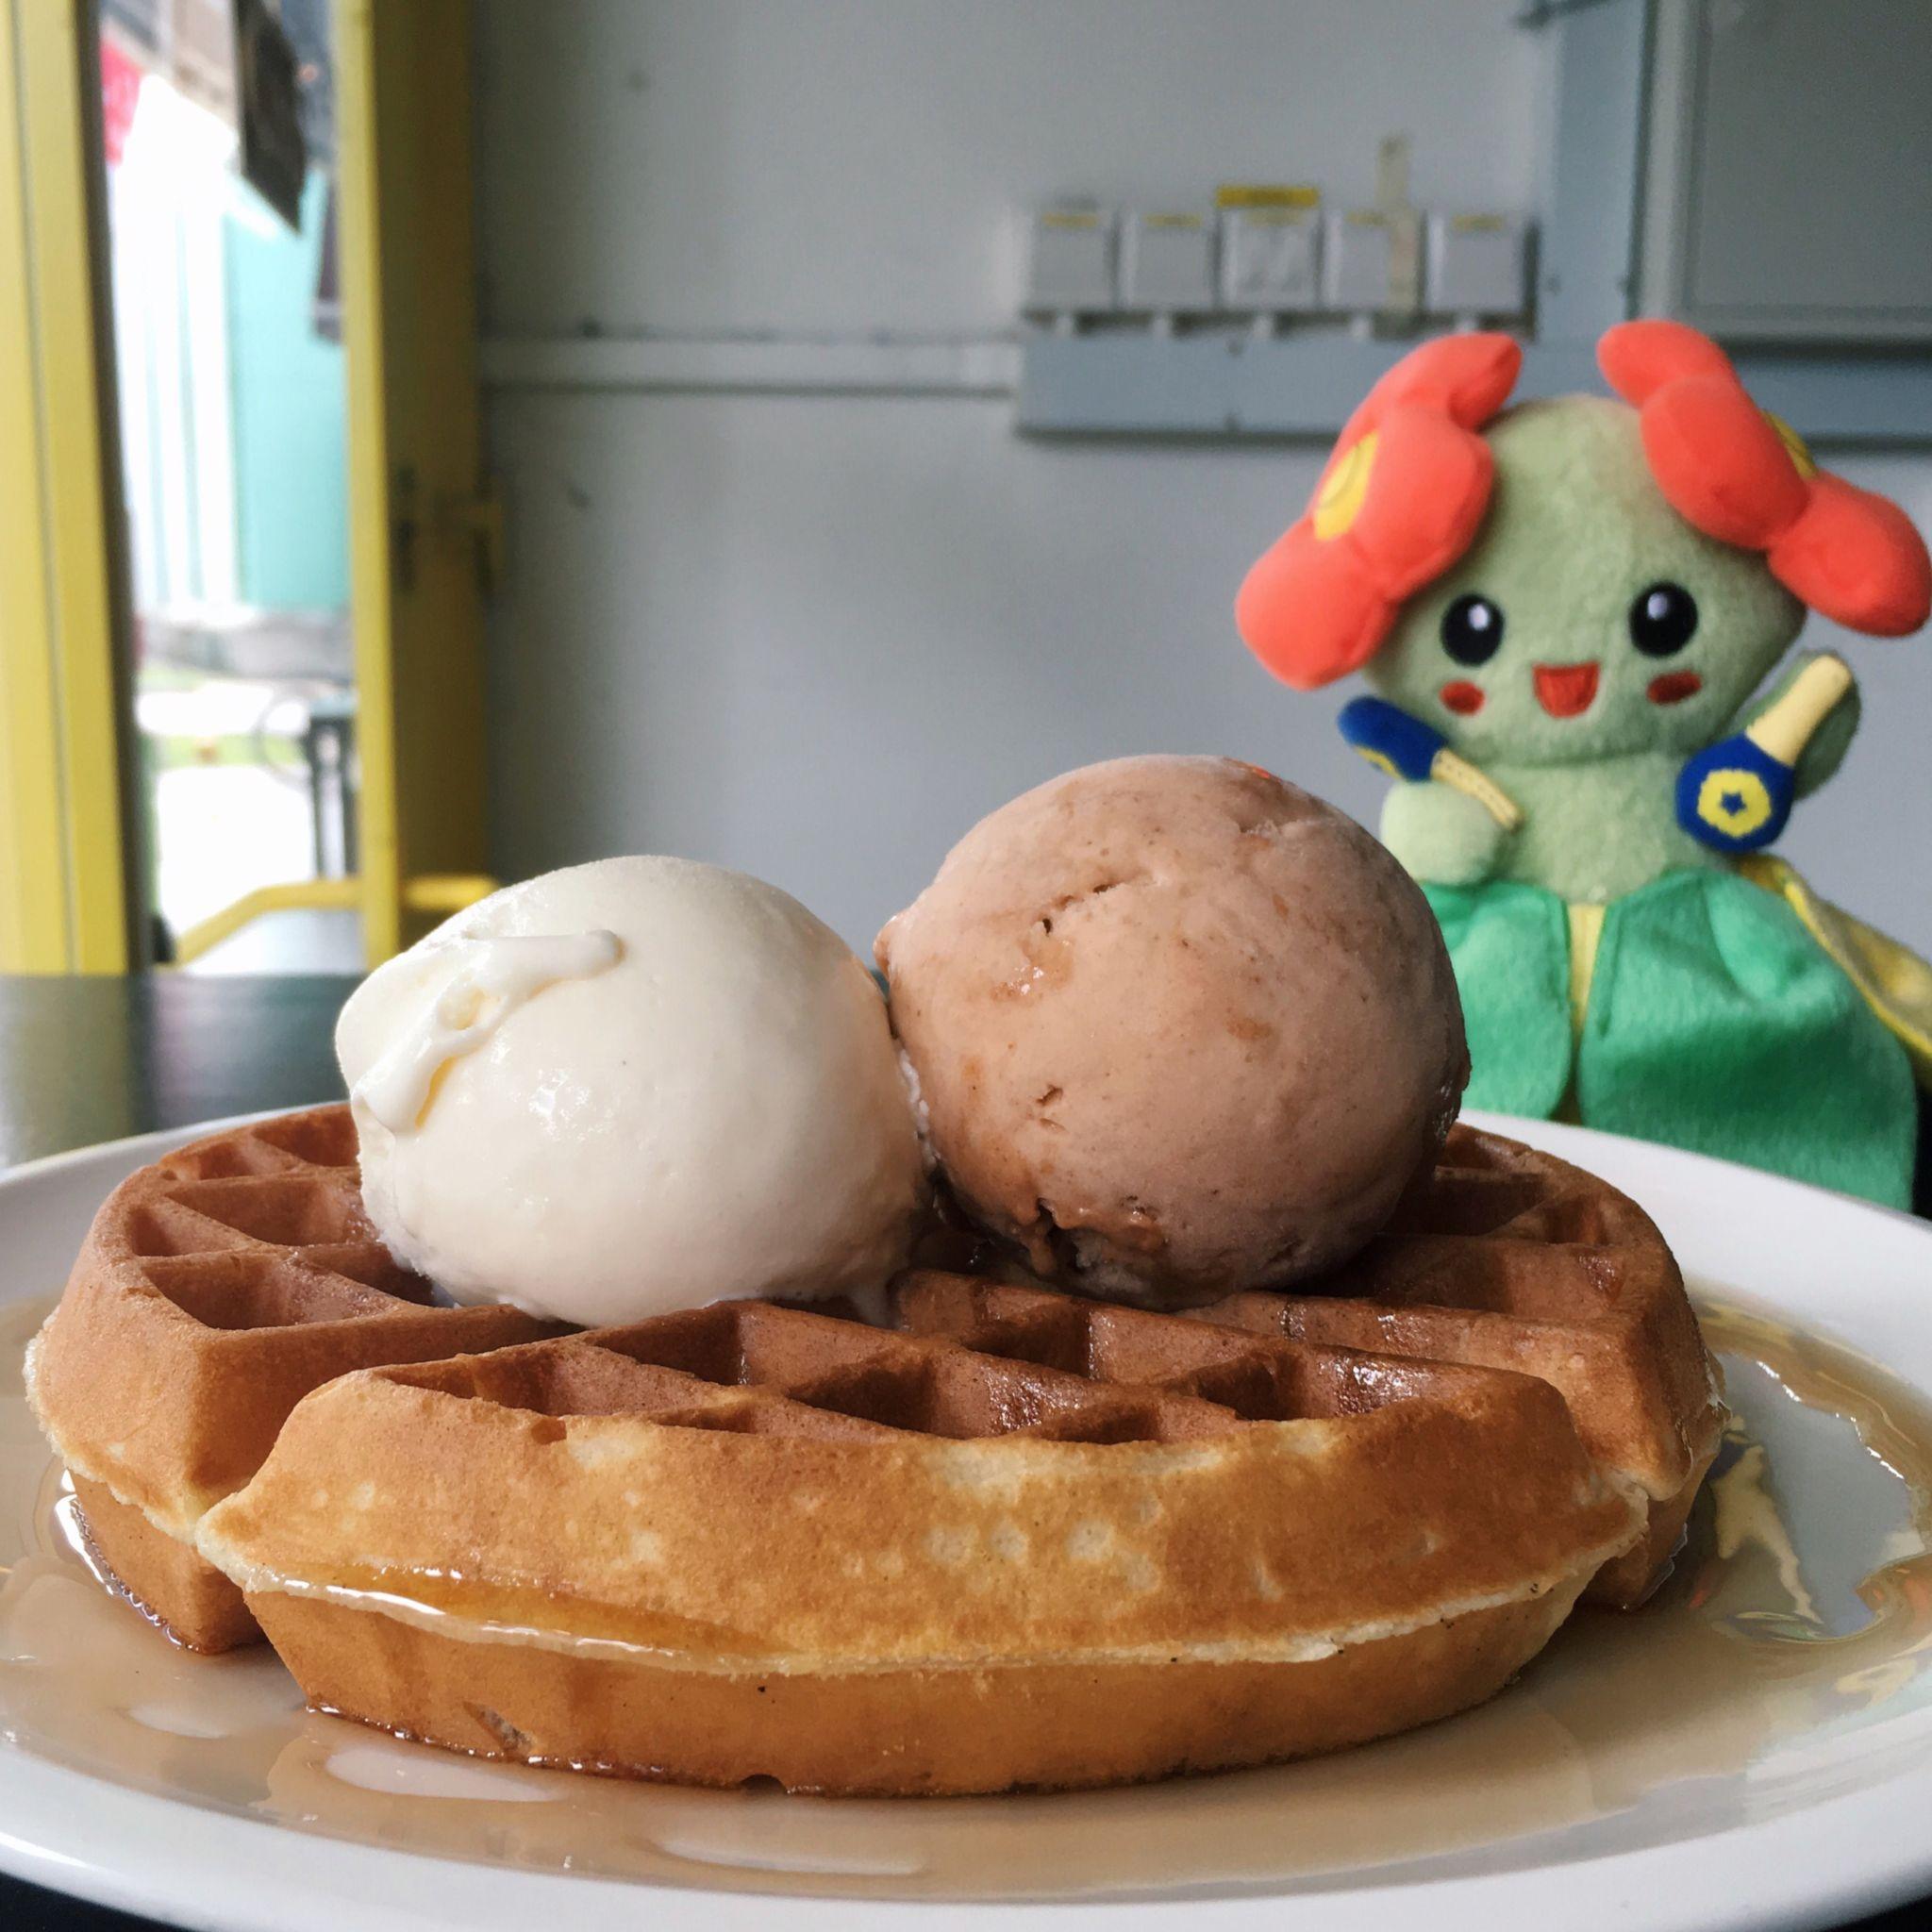 San Zar and White Rabbit on Waffle - Non Entrée Desserts